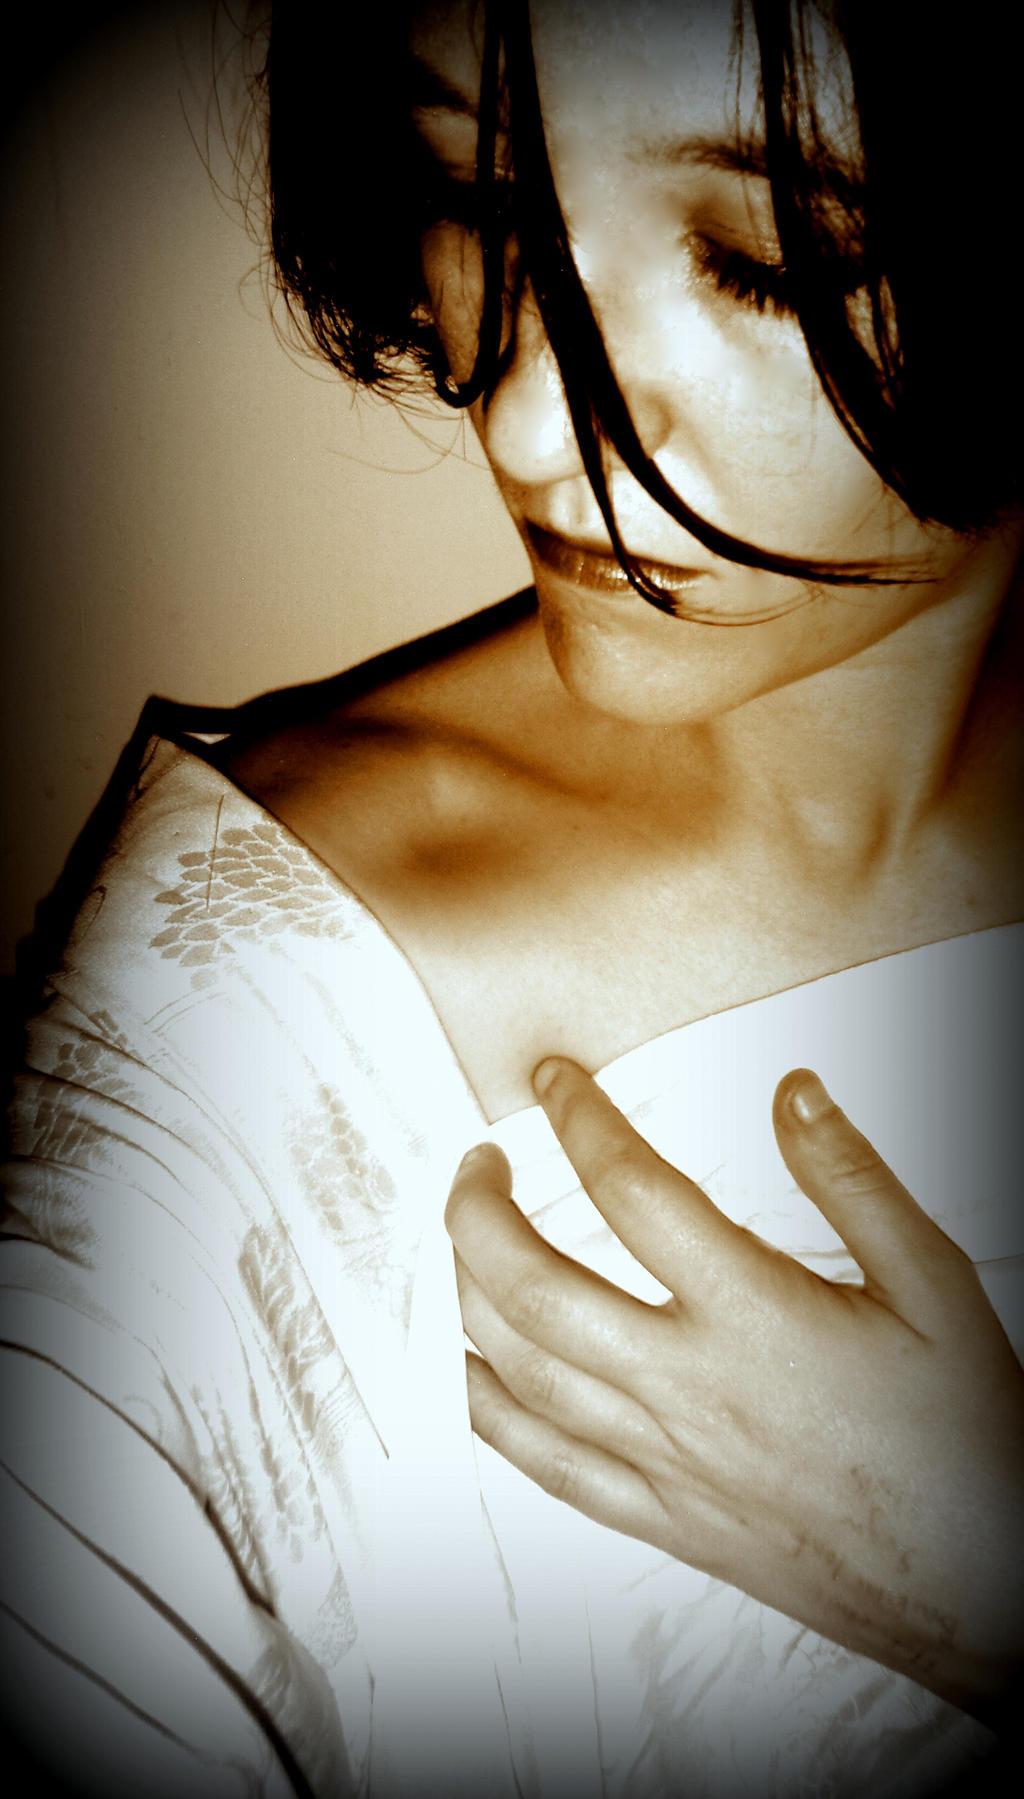 Djedra's Profile Picture